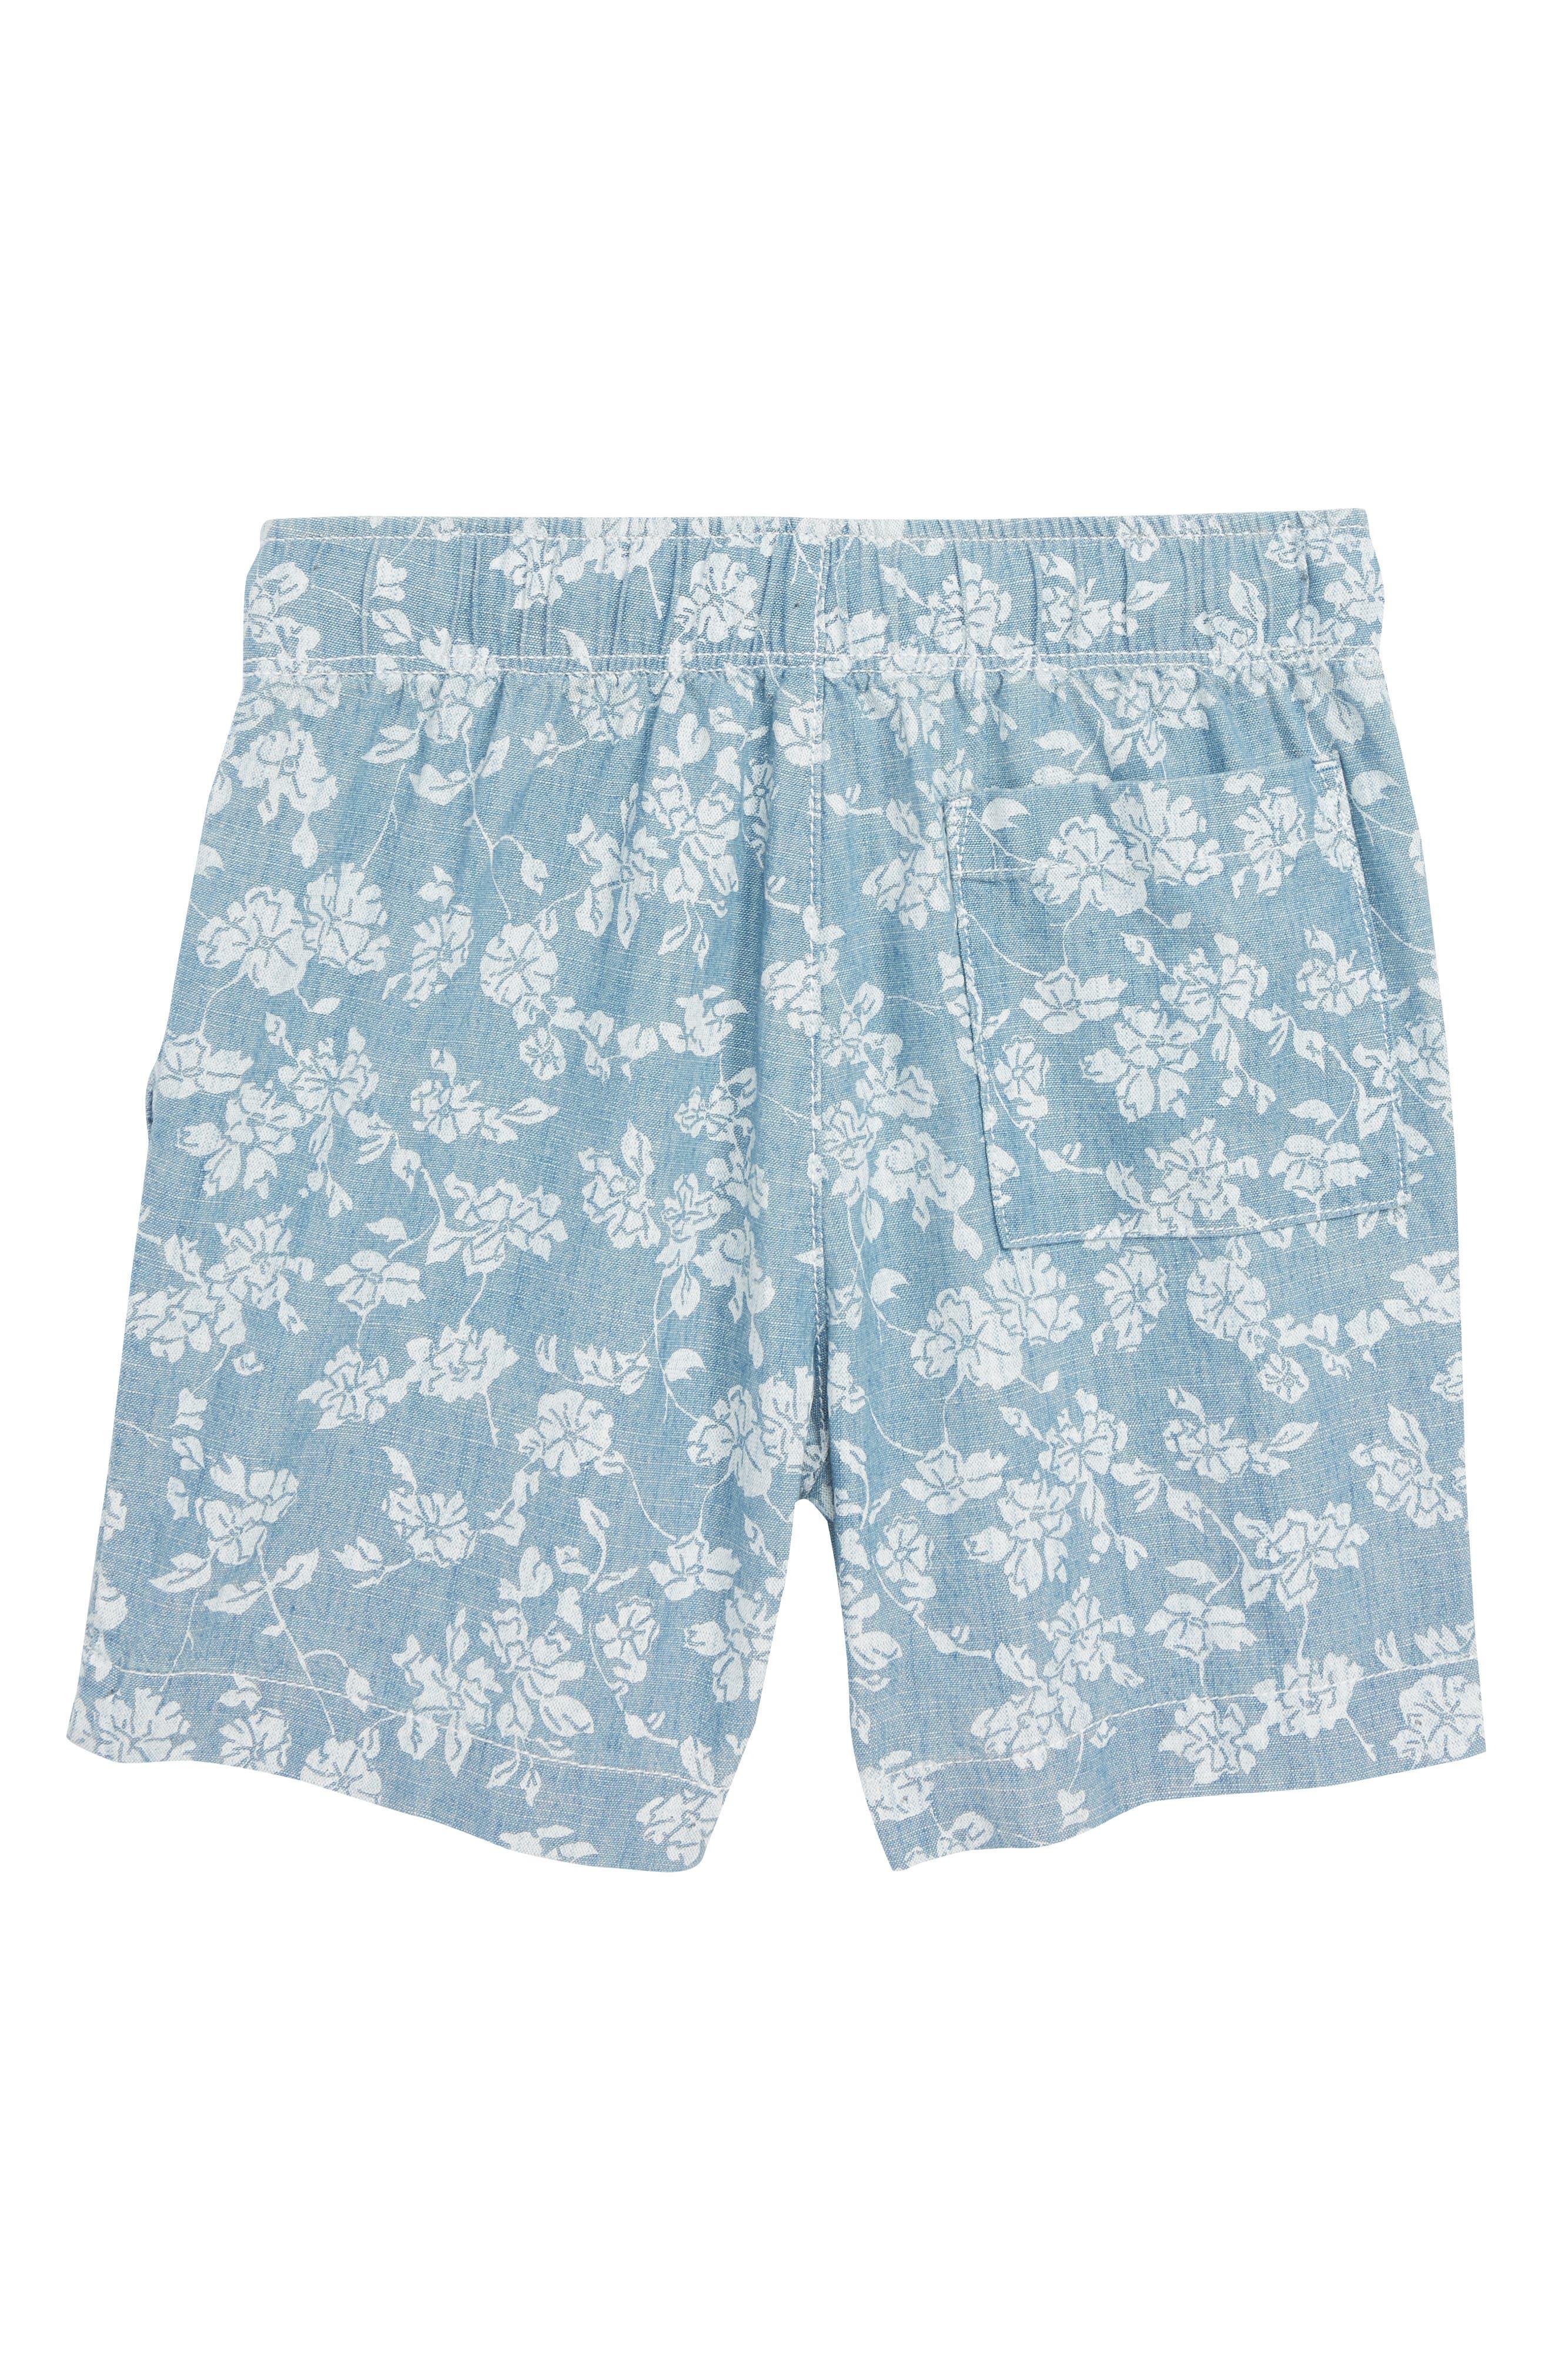 Floral Chambray Dock Shorts,                             Alternate thumbnail 2, color,                             400